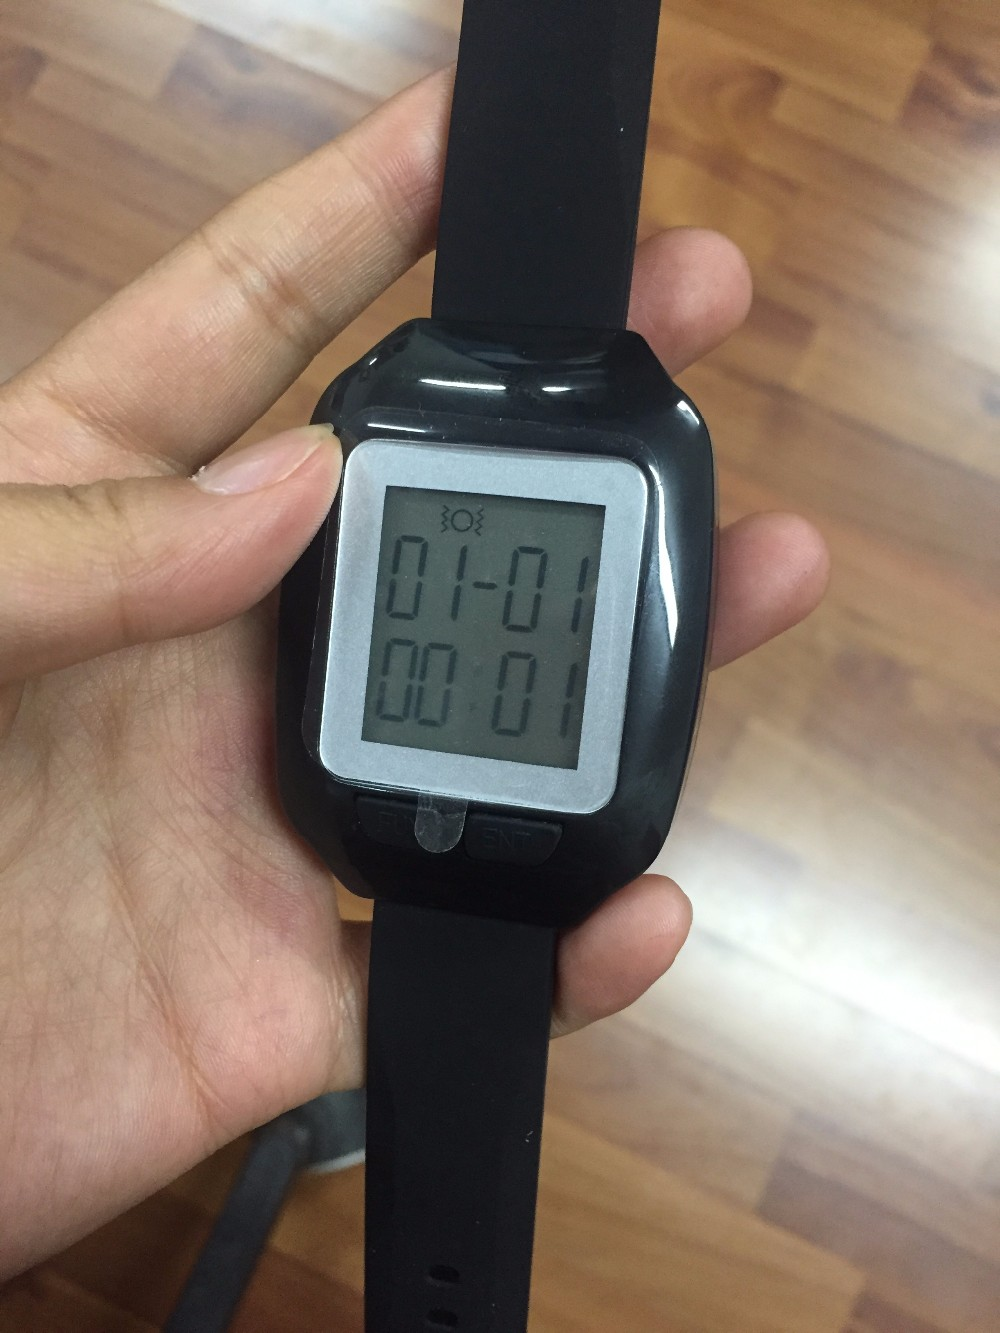 AC-S800  battery  watch